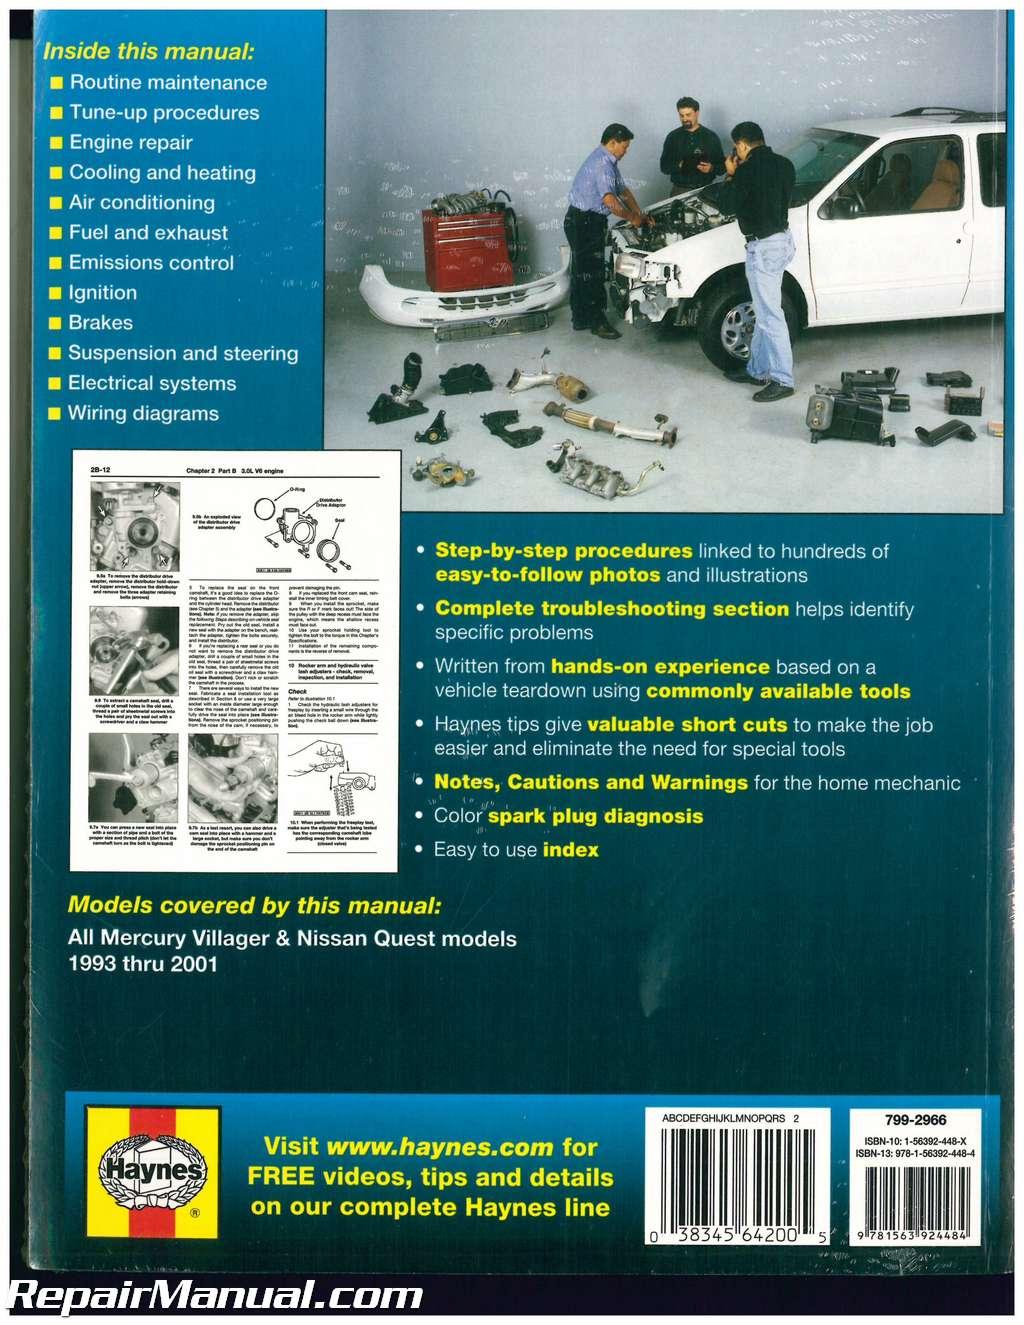 1993 Villager Fuse Box Diagram Wiring Library Mercury Repair Manual Thumb